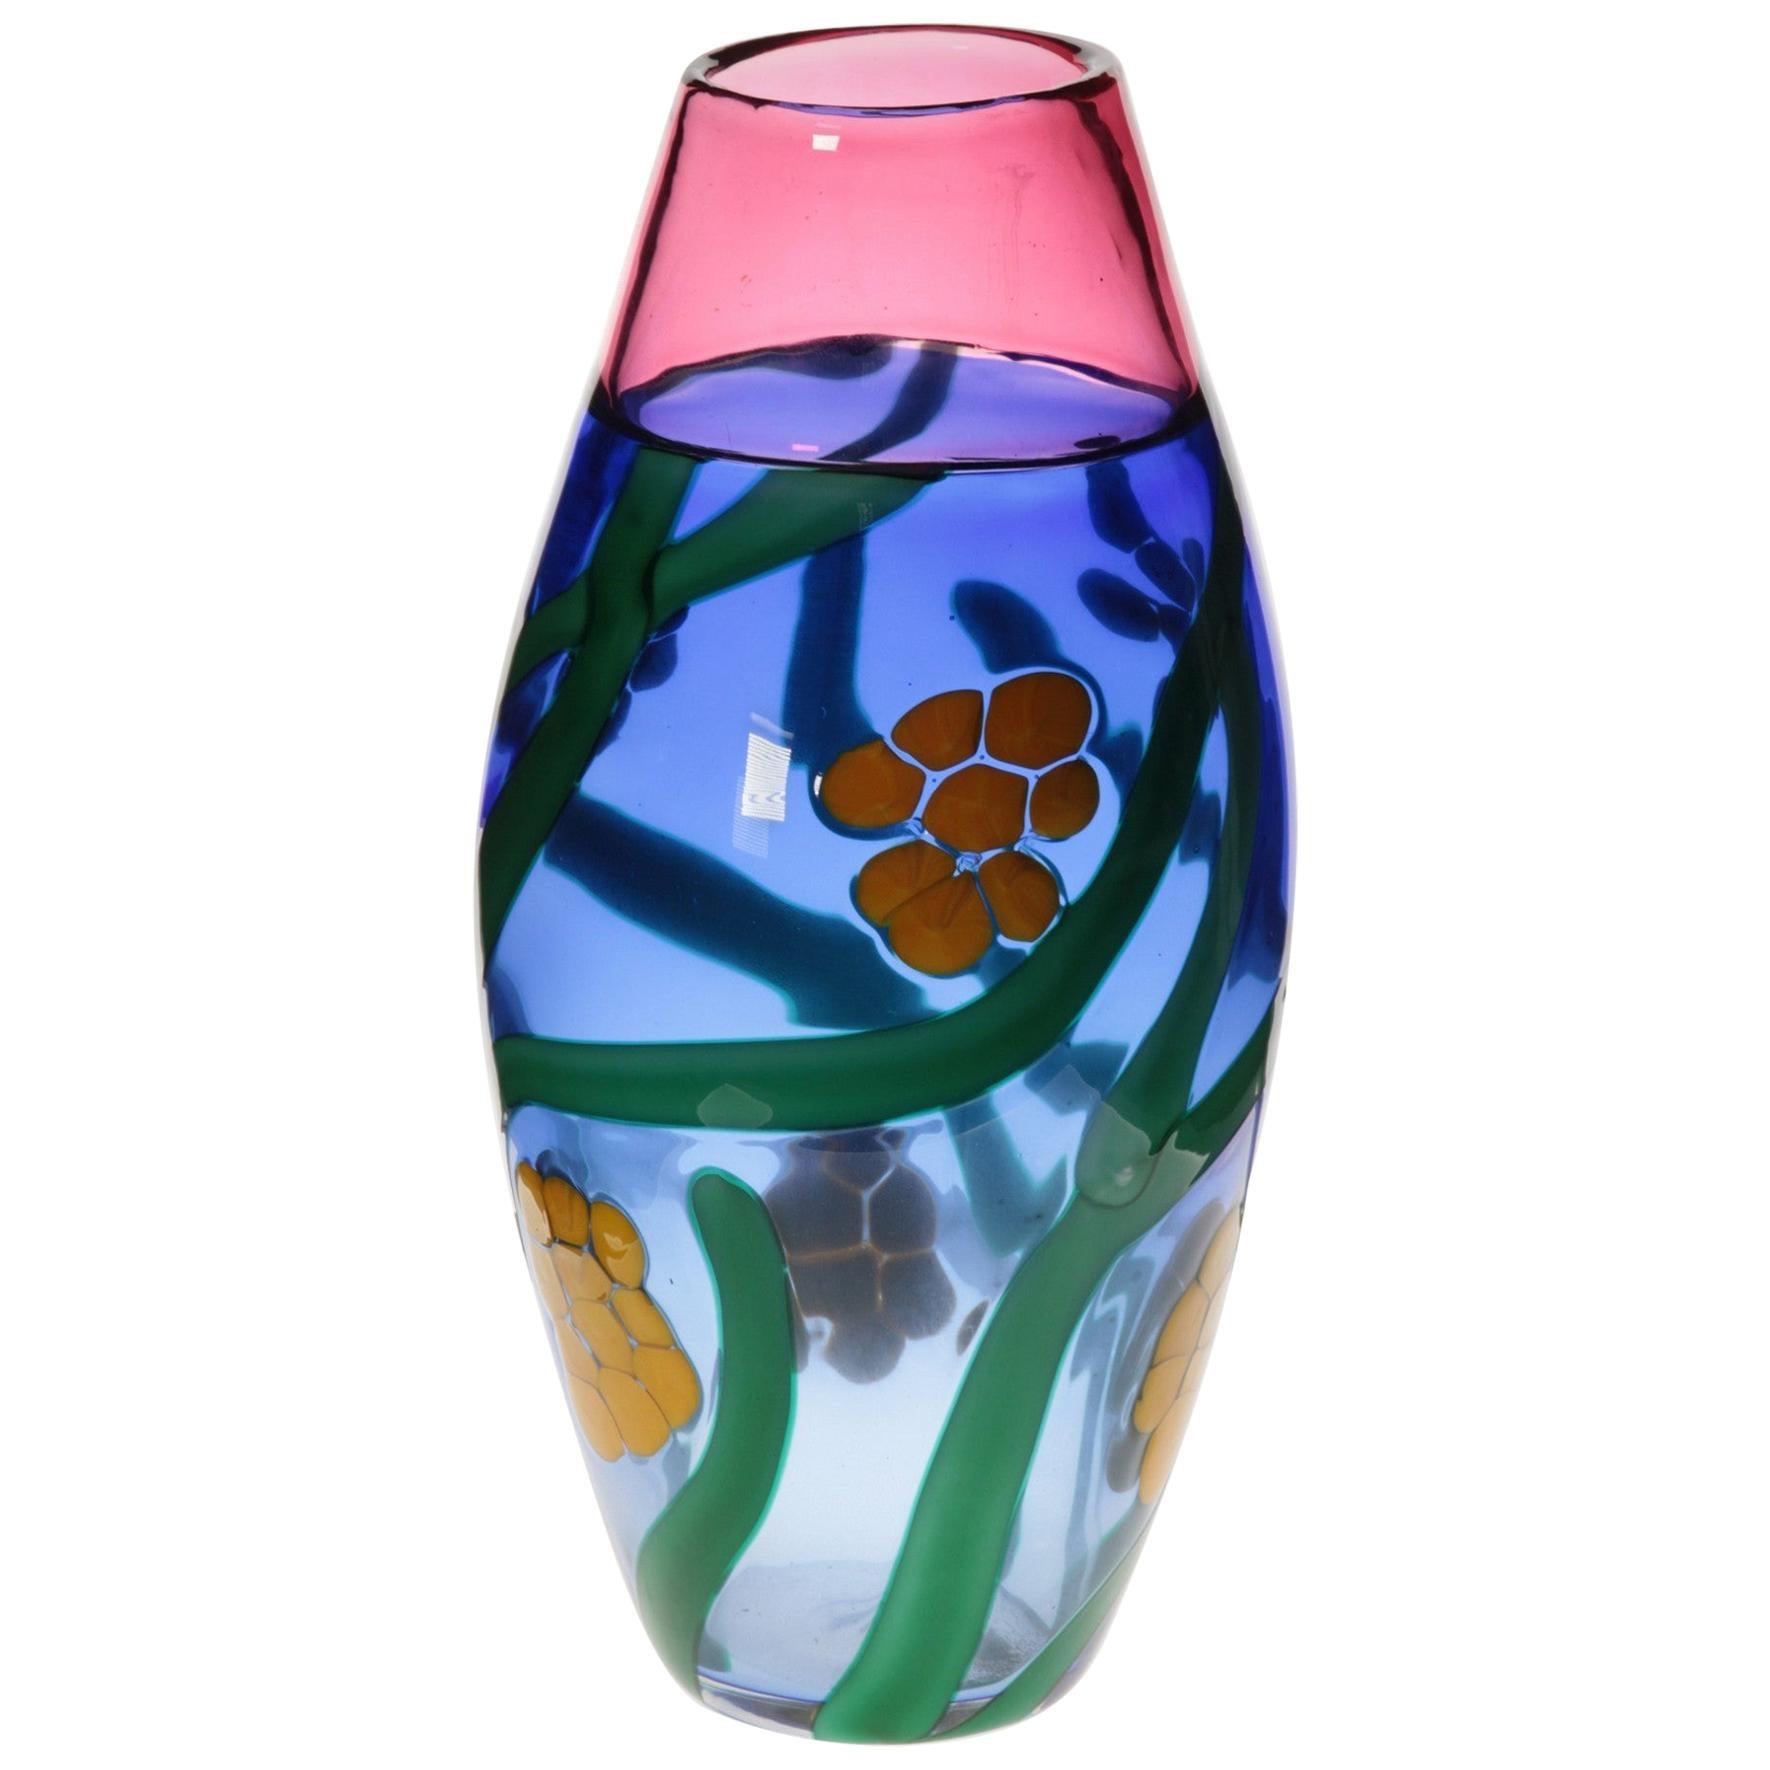 Berit Johansson for Pauly, Murano Incalmo Vase, Design of Mimosa Flowers, Signed